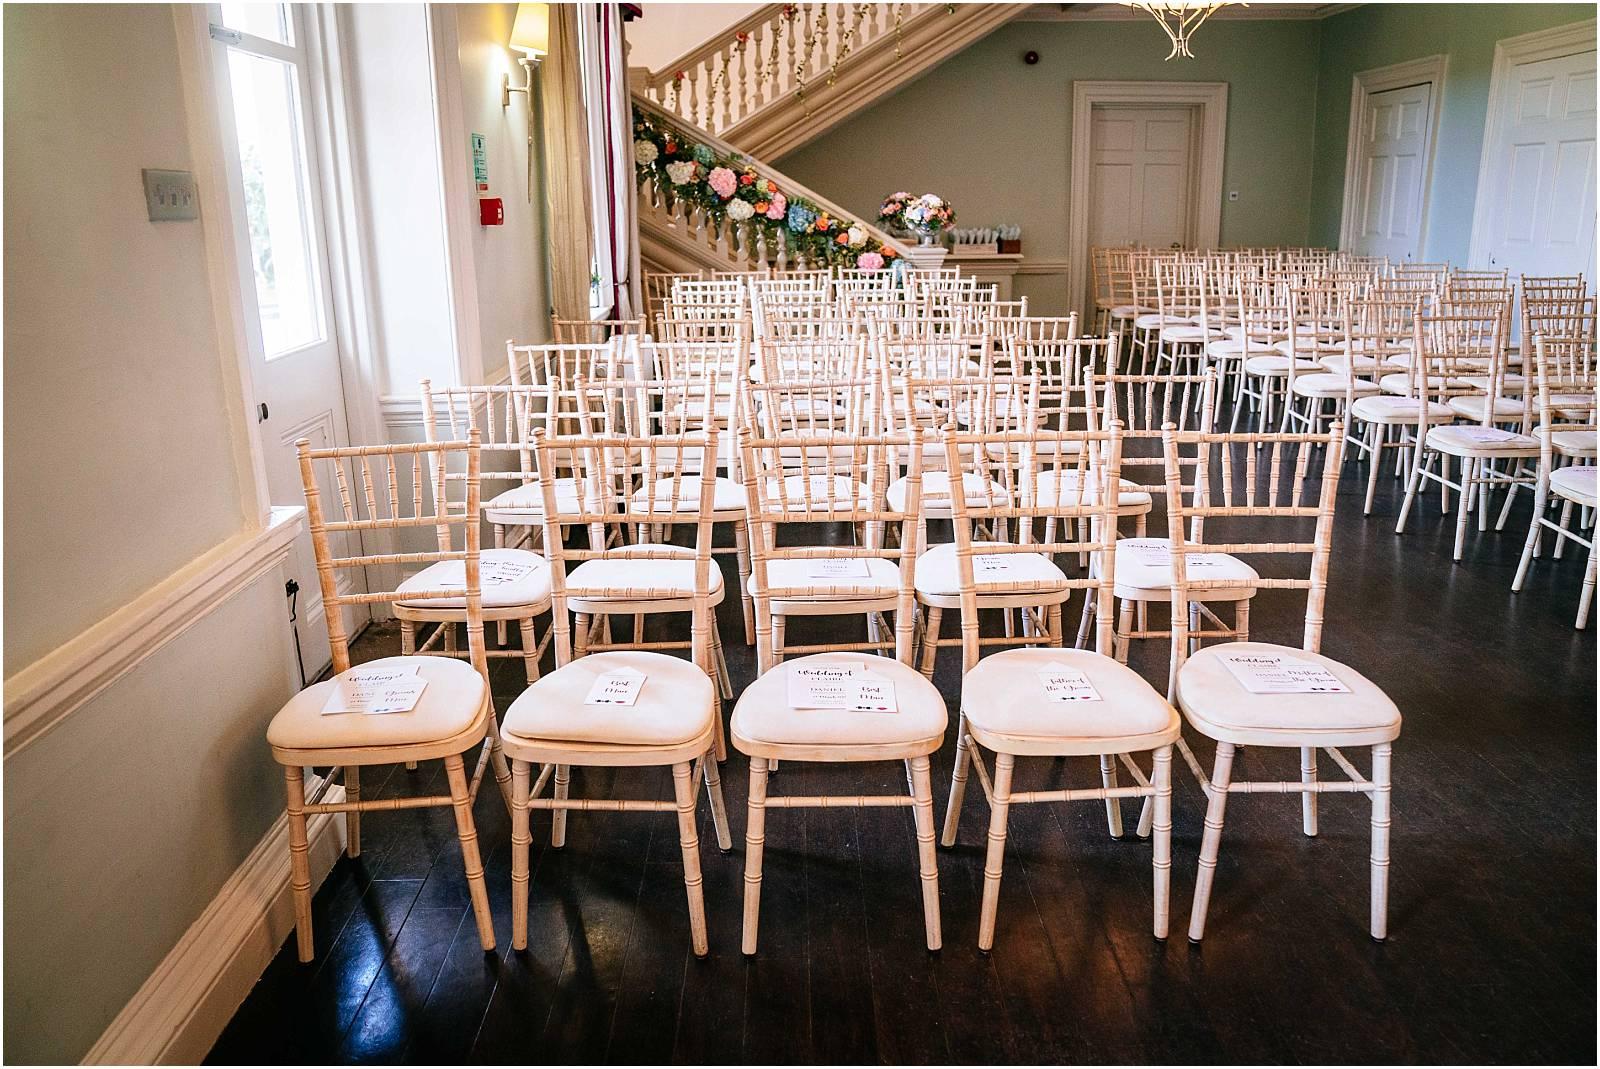 morden hall wedding ceremony room